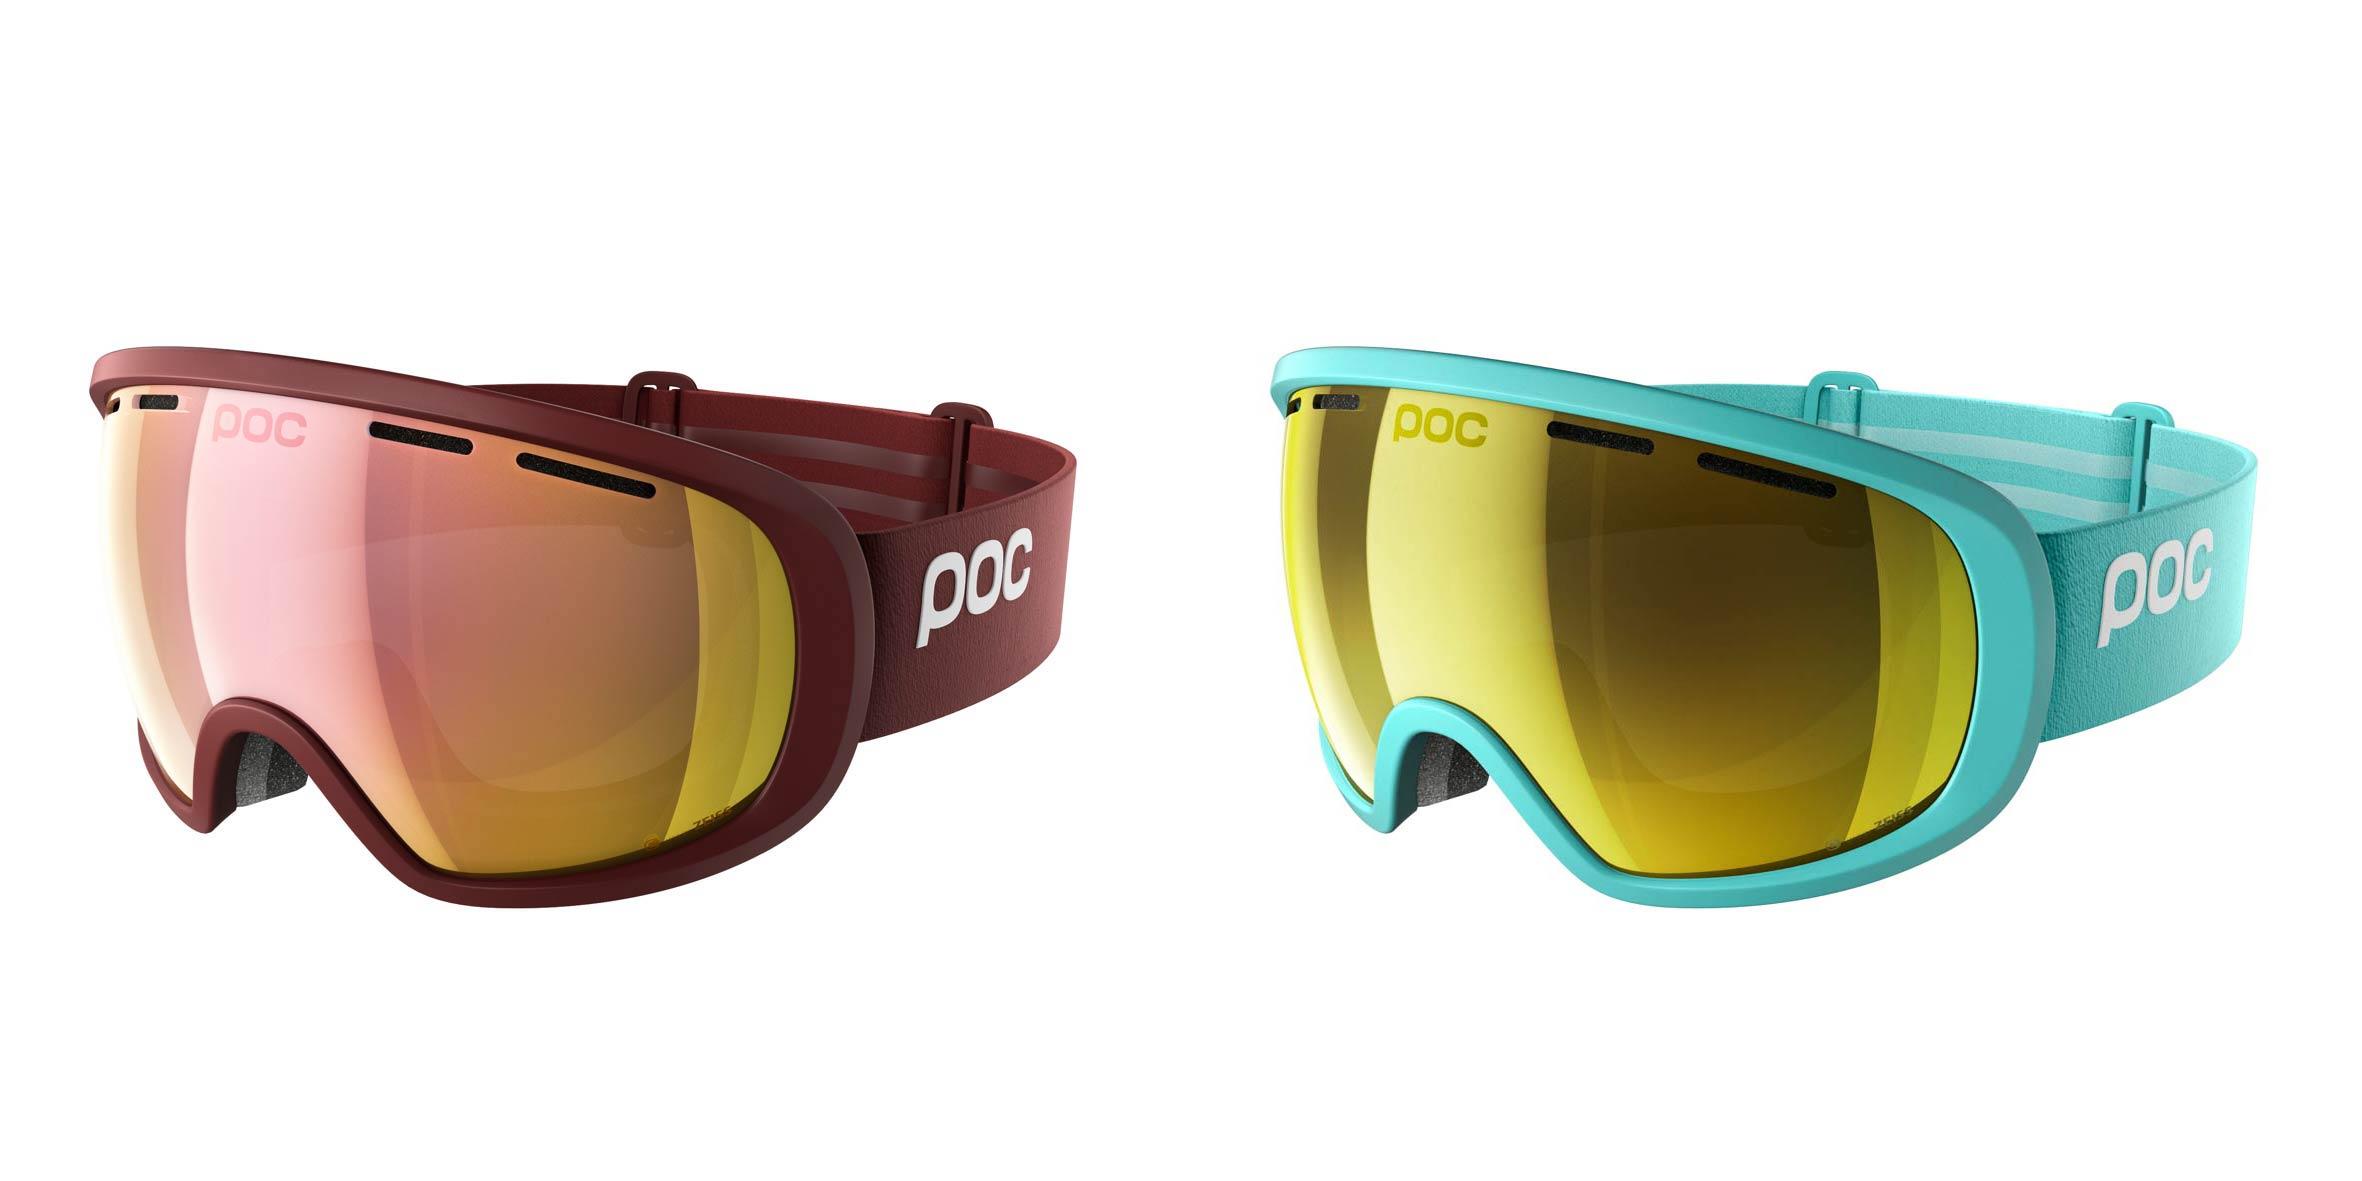 Die POCFovea Clarity 18/19 Skibrille